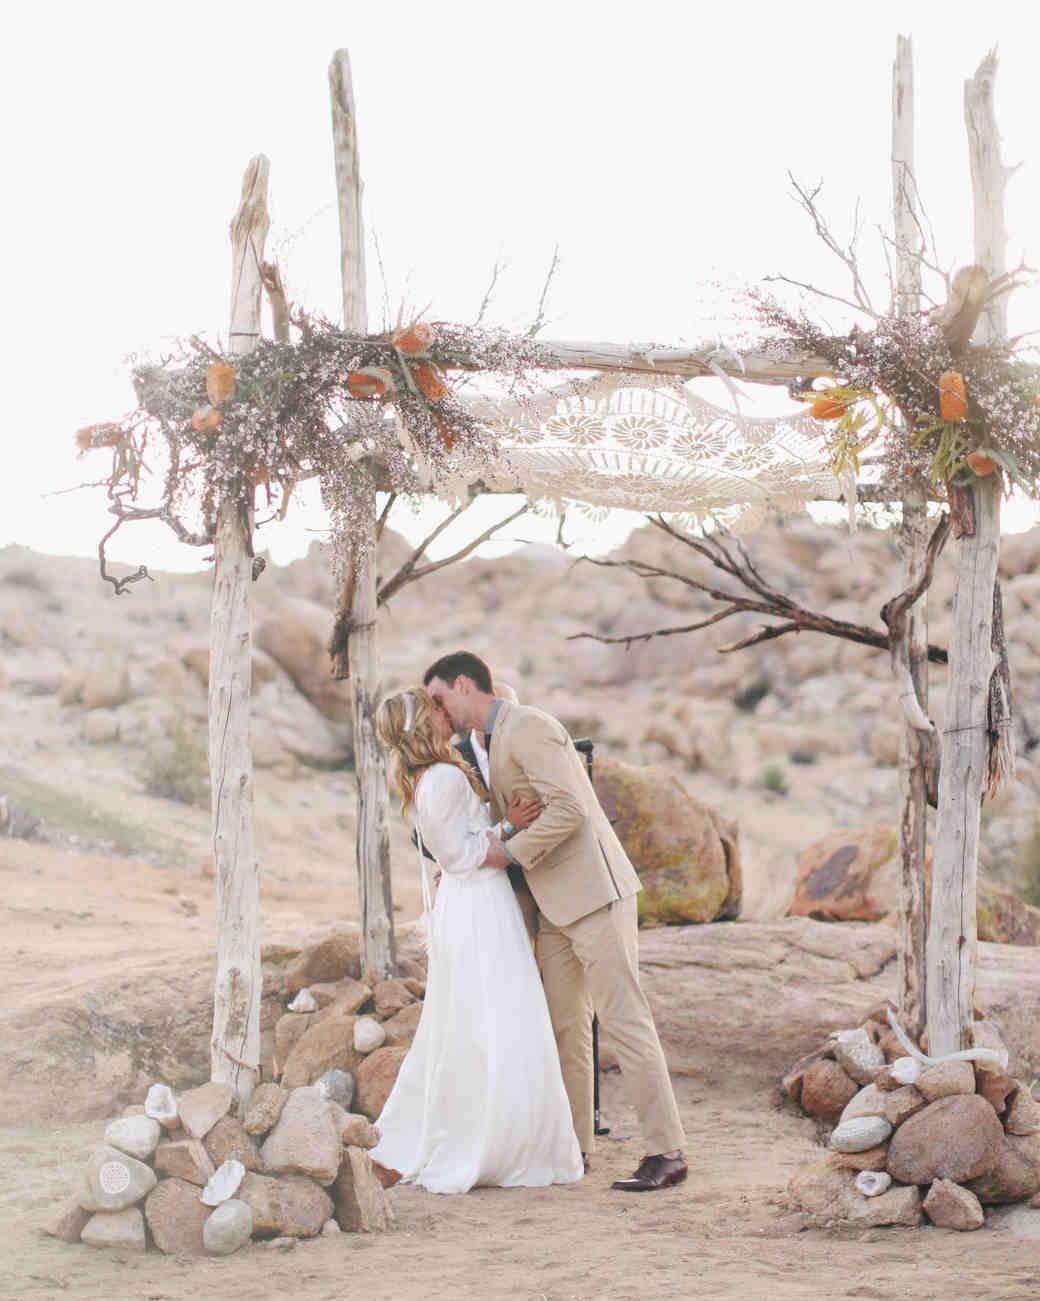 Boho Chic Wedding Ideas for Free Spirited Brides and